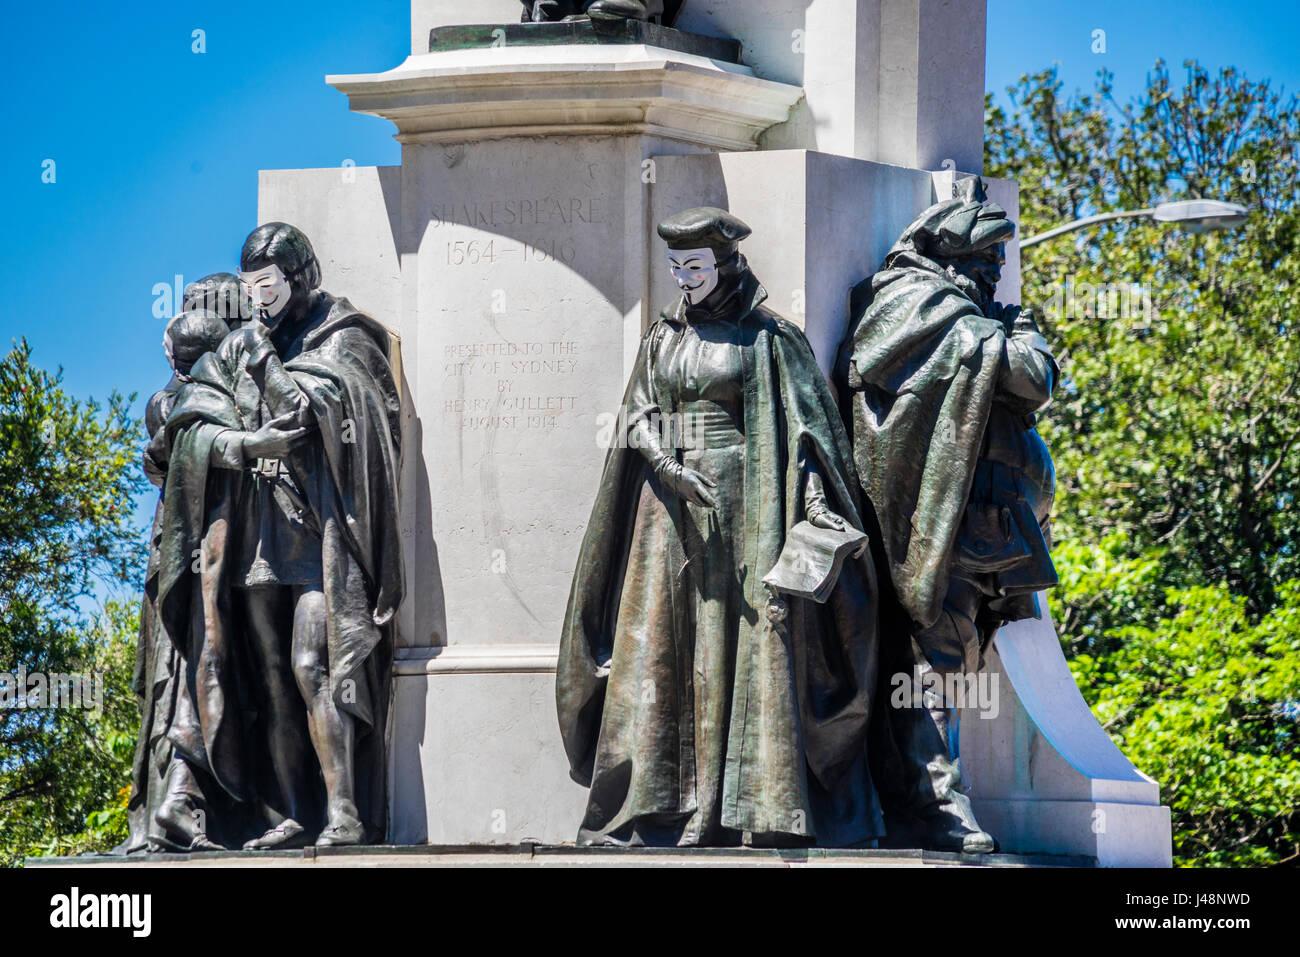 Australia, New South Wales, Sydney, Shakespeare Place, the Shakespear characters of the shakespear memorial wearing - Stock Image